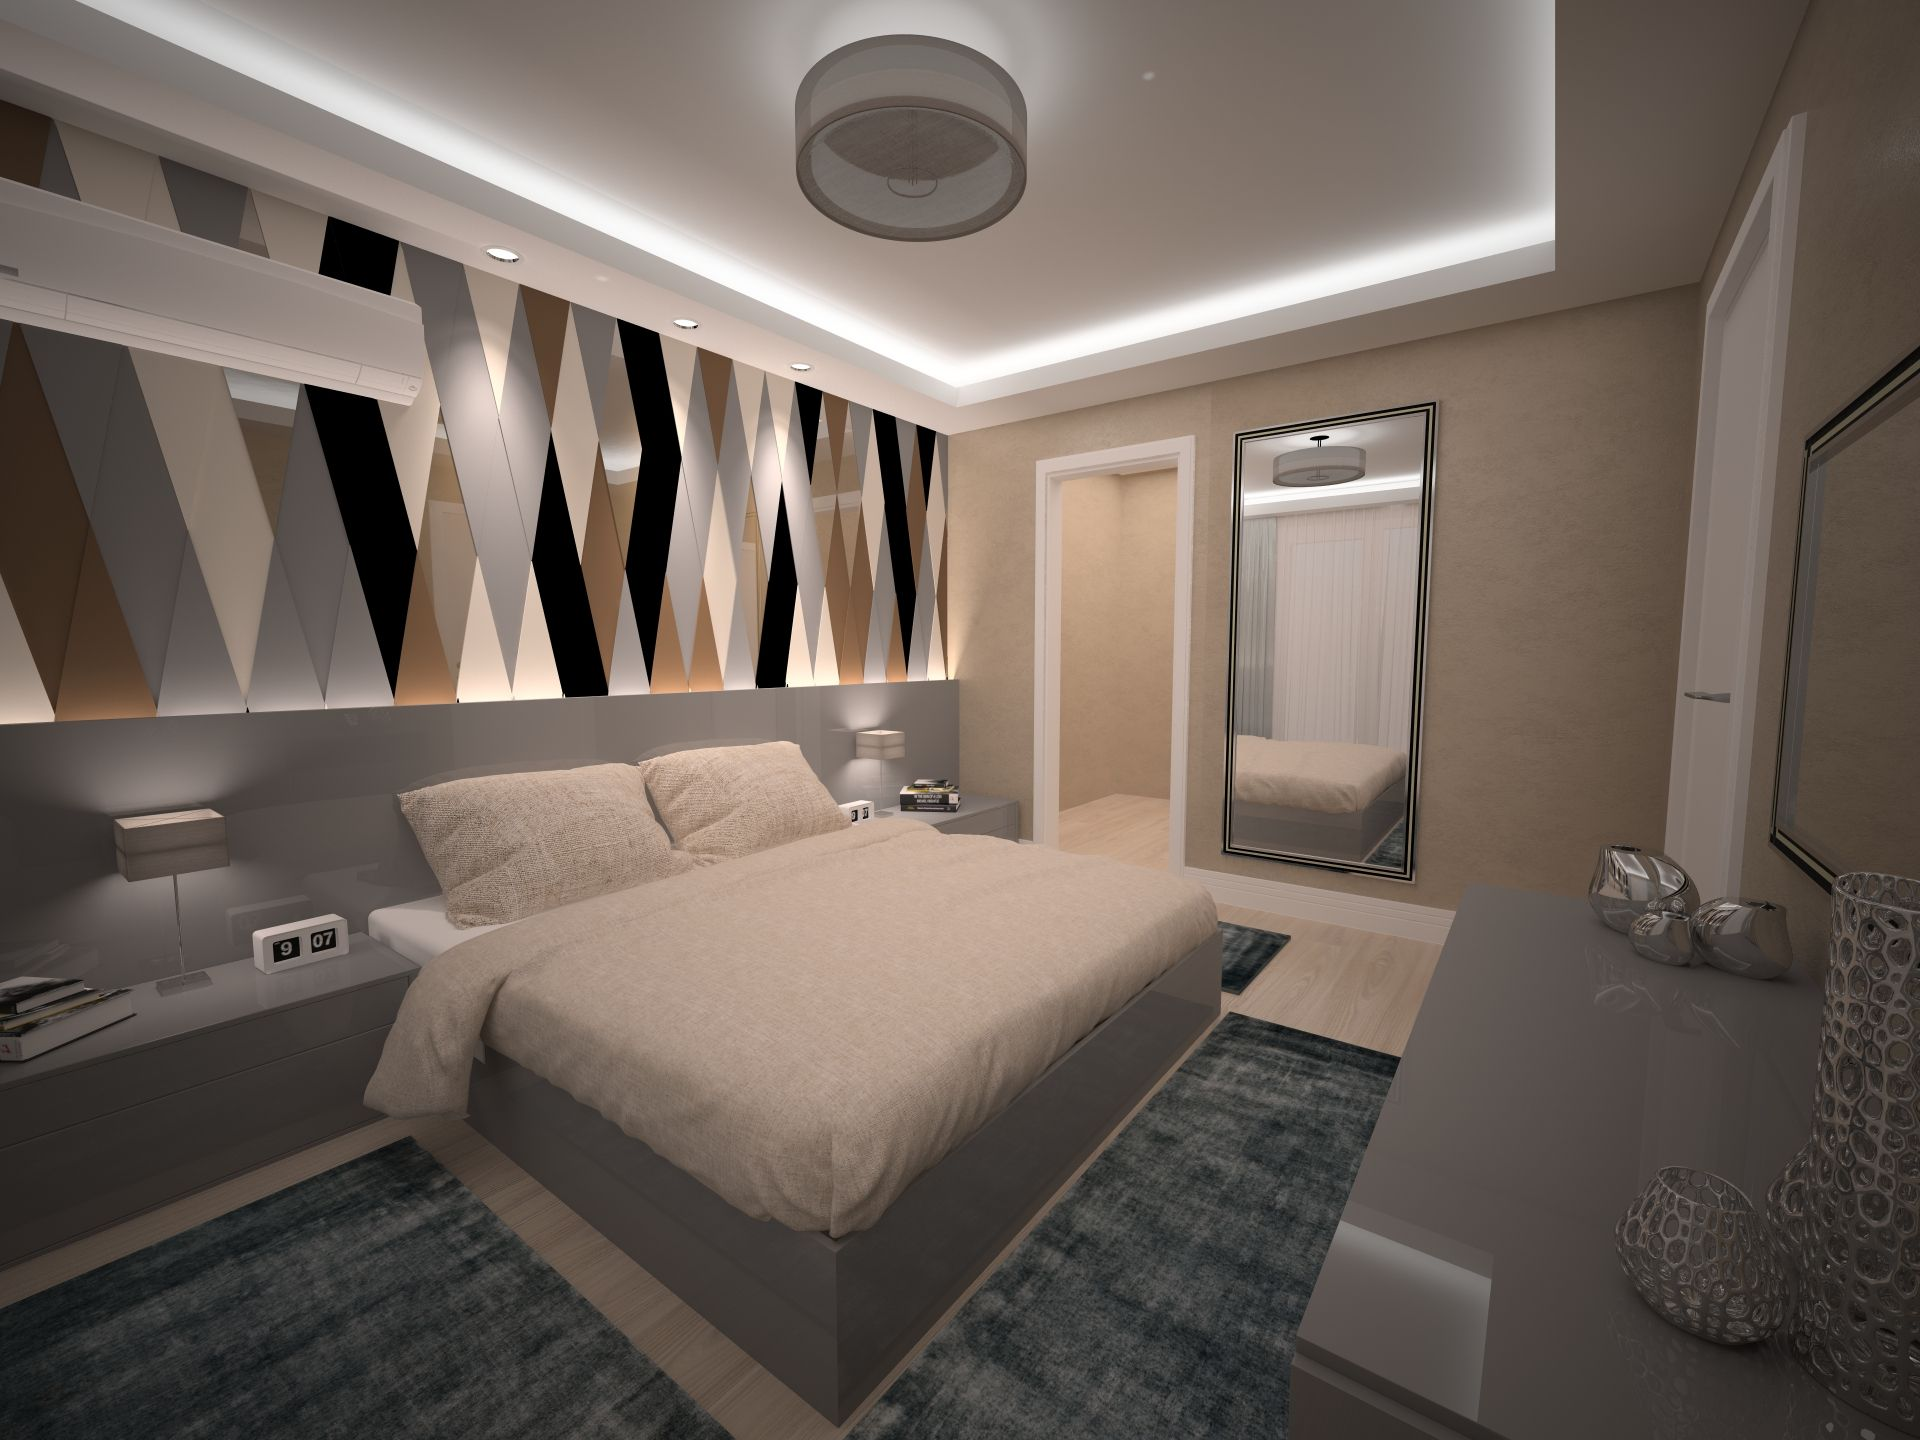 Modern Yatak Odasi Tasarimi Bf Ic Mimarlik Modern Bedroom